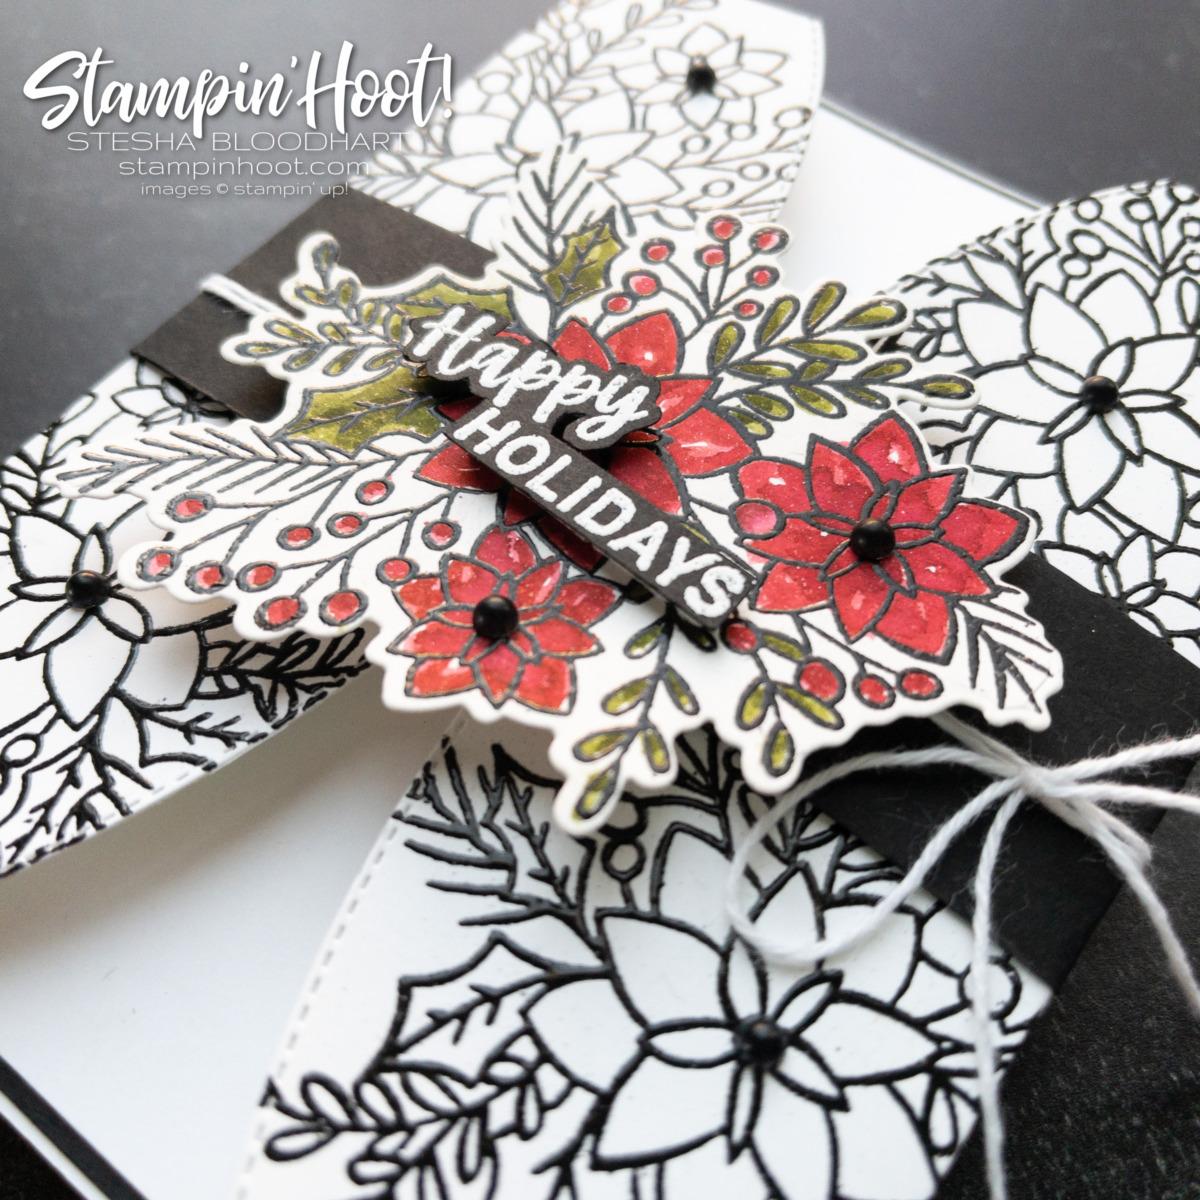 Words of Cheer Happy Holidays Gatefold Card - Stesha Bloodhart, Stampin' Hoot!